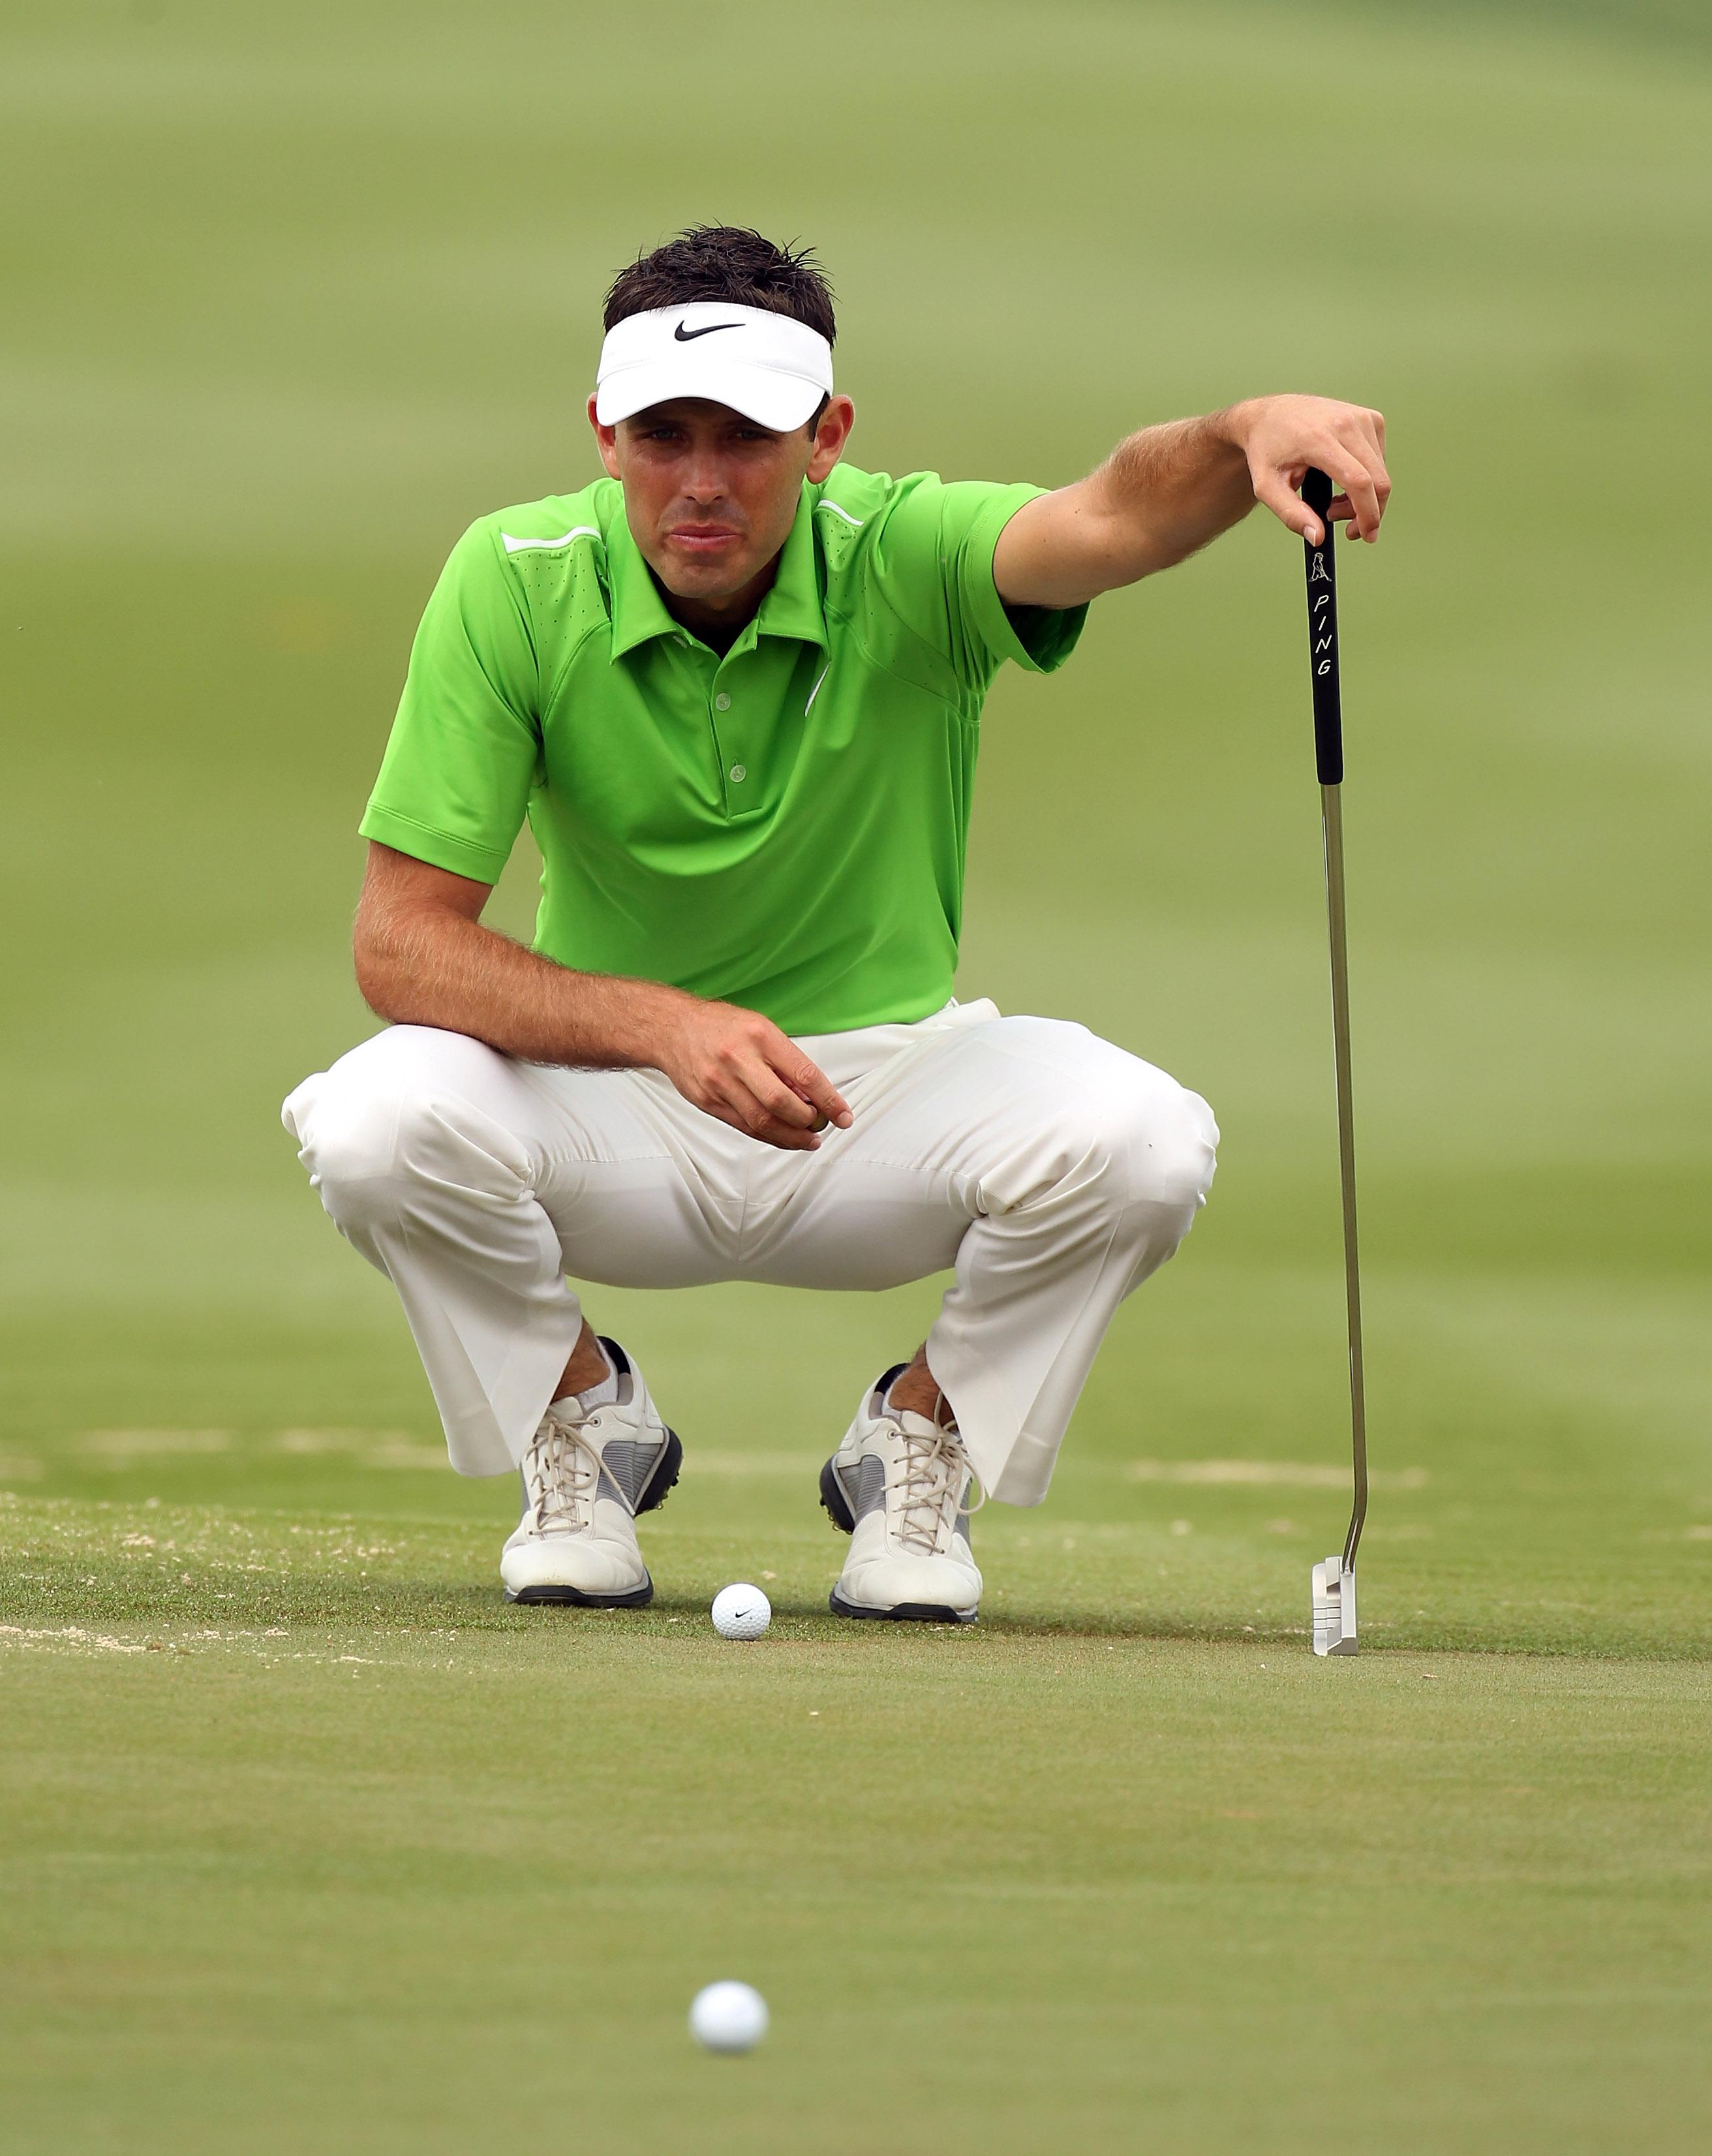 ABU DHABI, UNITED ARAB EMIRATES - JANUARY 22:  Charl Schwartzel of South Africa checks the line of his putt during the third round of the Abu Dhabi HSBC Golf Championship at the Abu Dhabi Golf Club on January 22, 2011 in Abu Dhabi, United Arab Emirates.